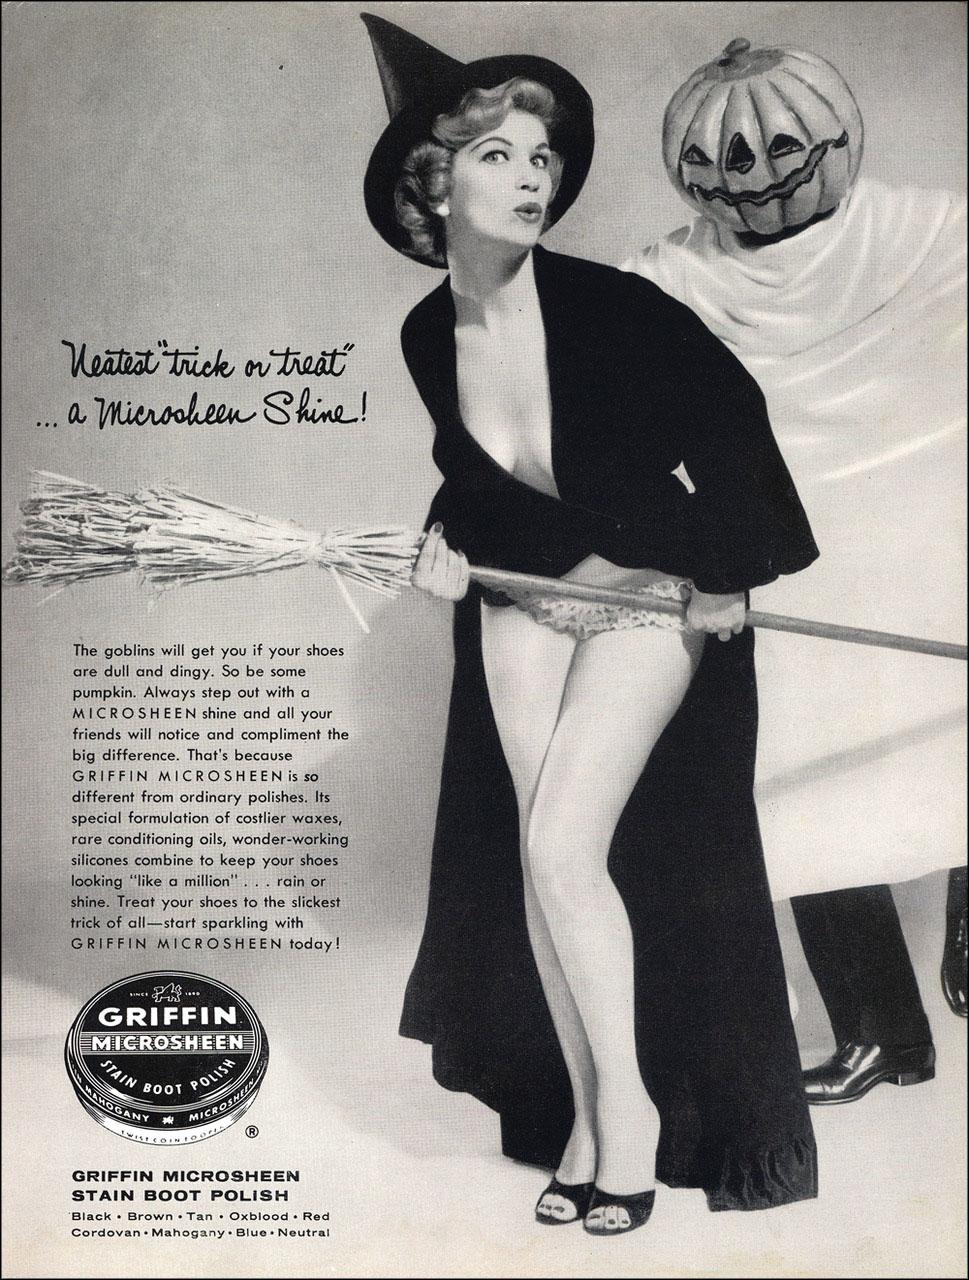 Vintage Halloween ad (Griifin Microsheen, 1956)